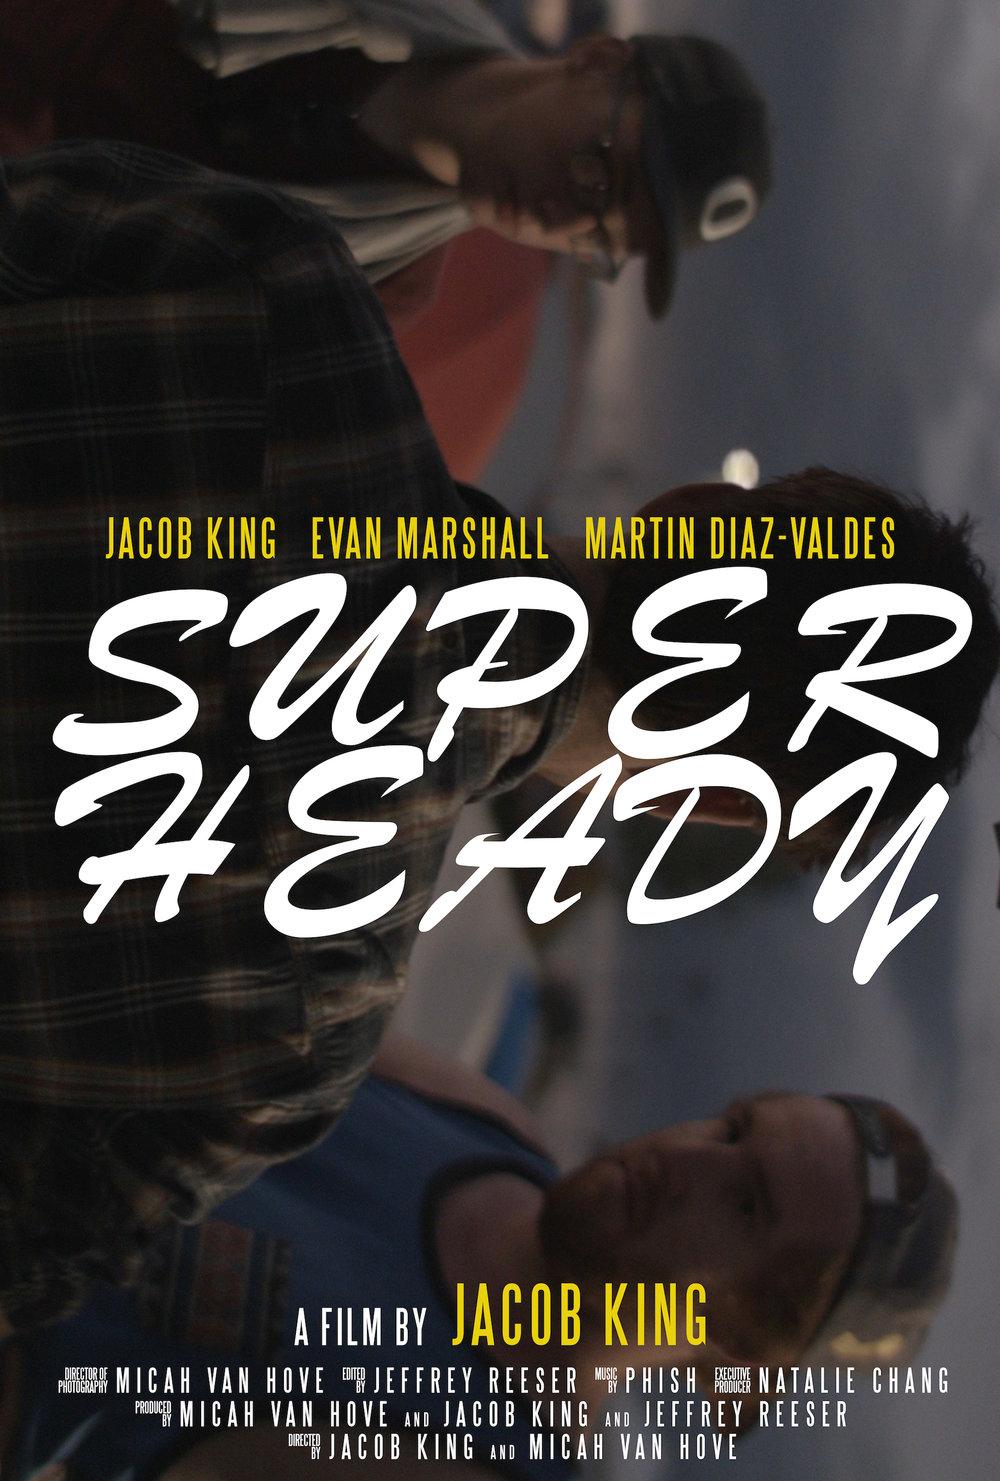 SuperHeady_Poster_v3.4_Squarespace.jpg